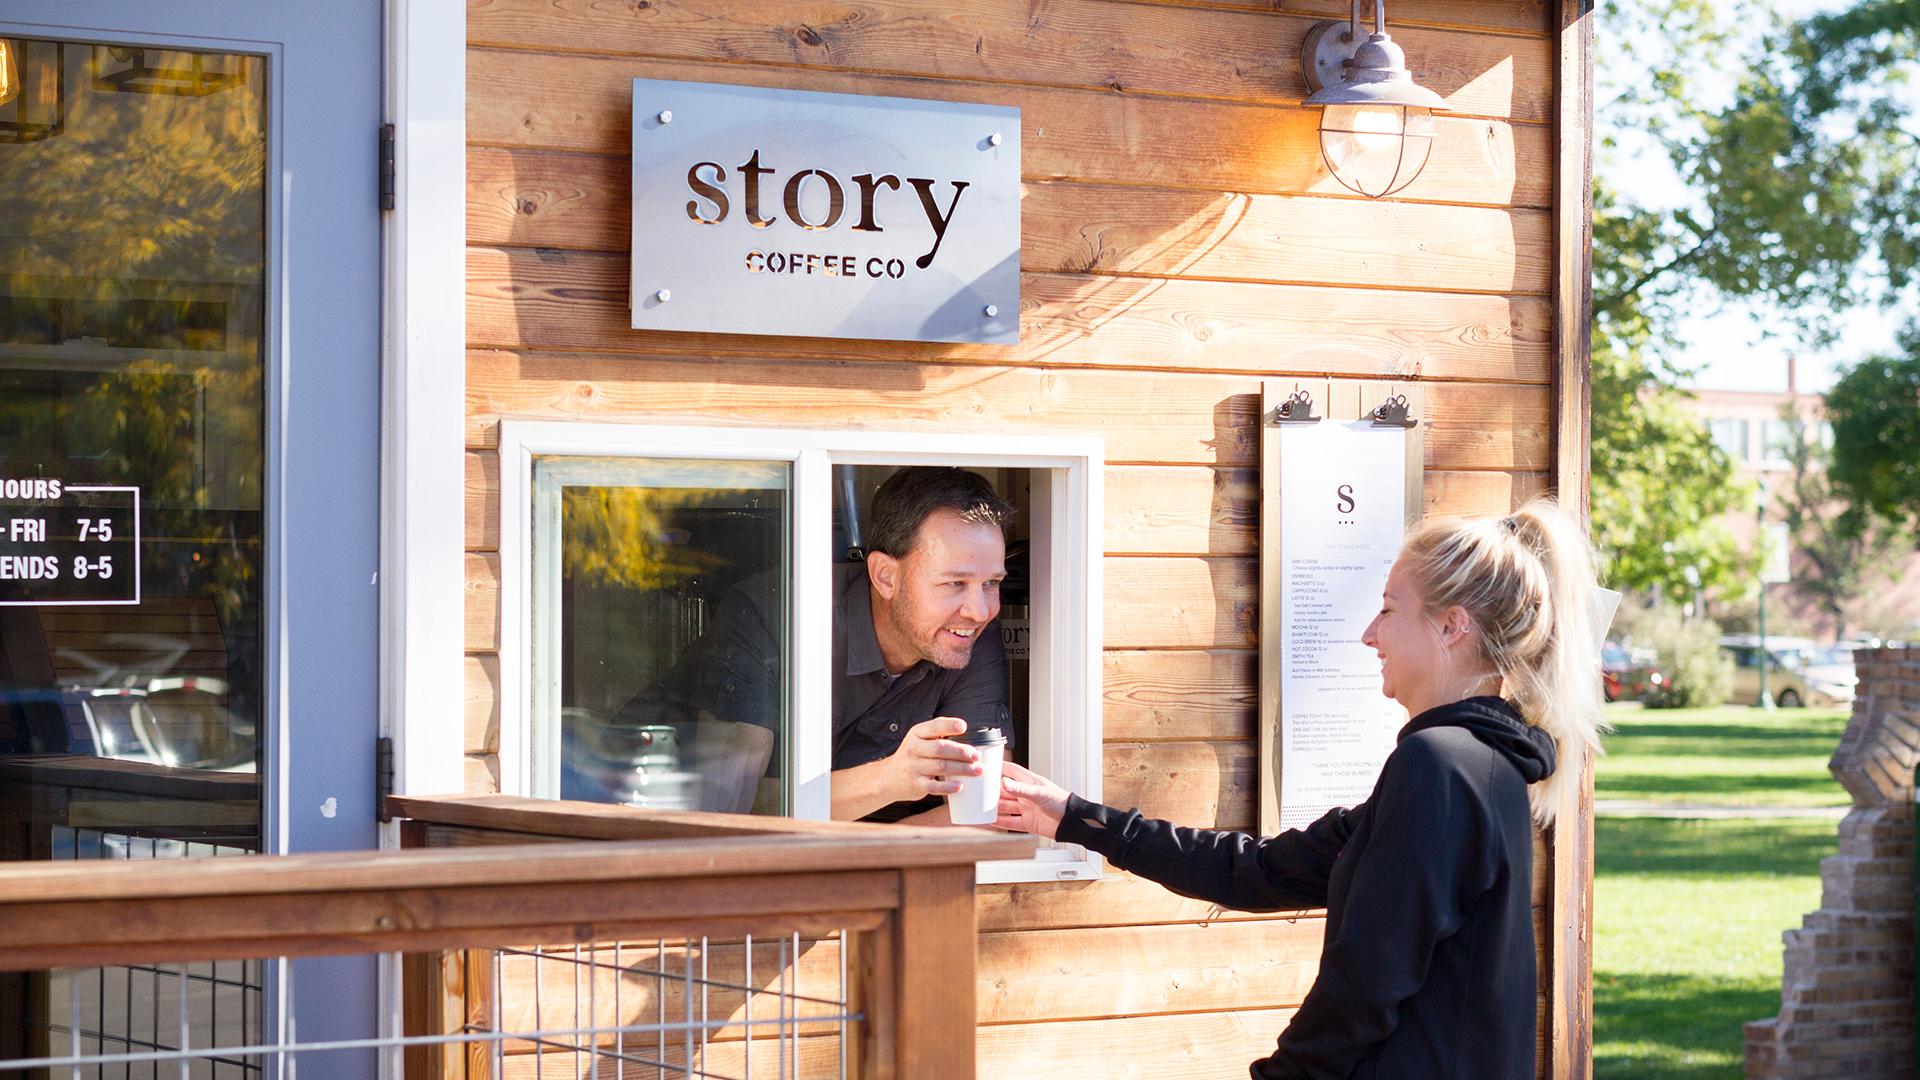 story-coffee-co-casestudy-10.jpg